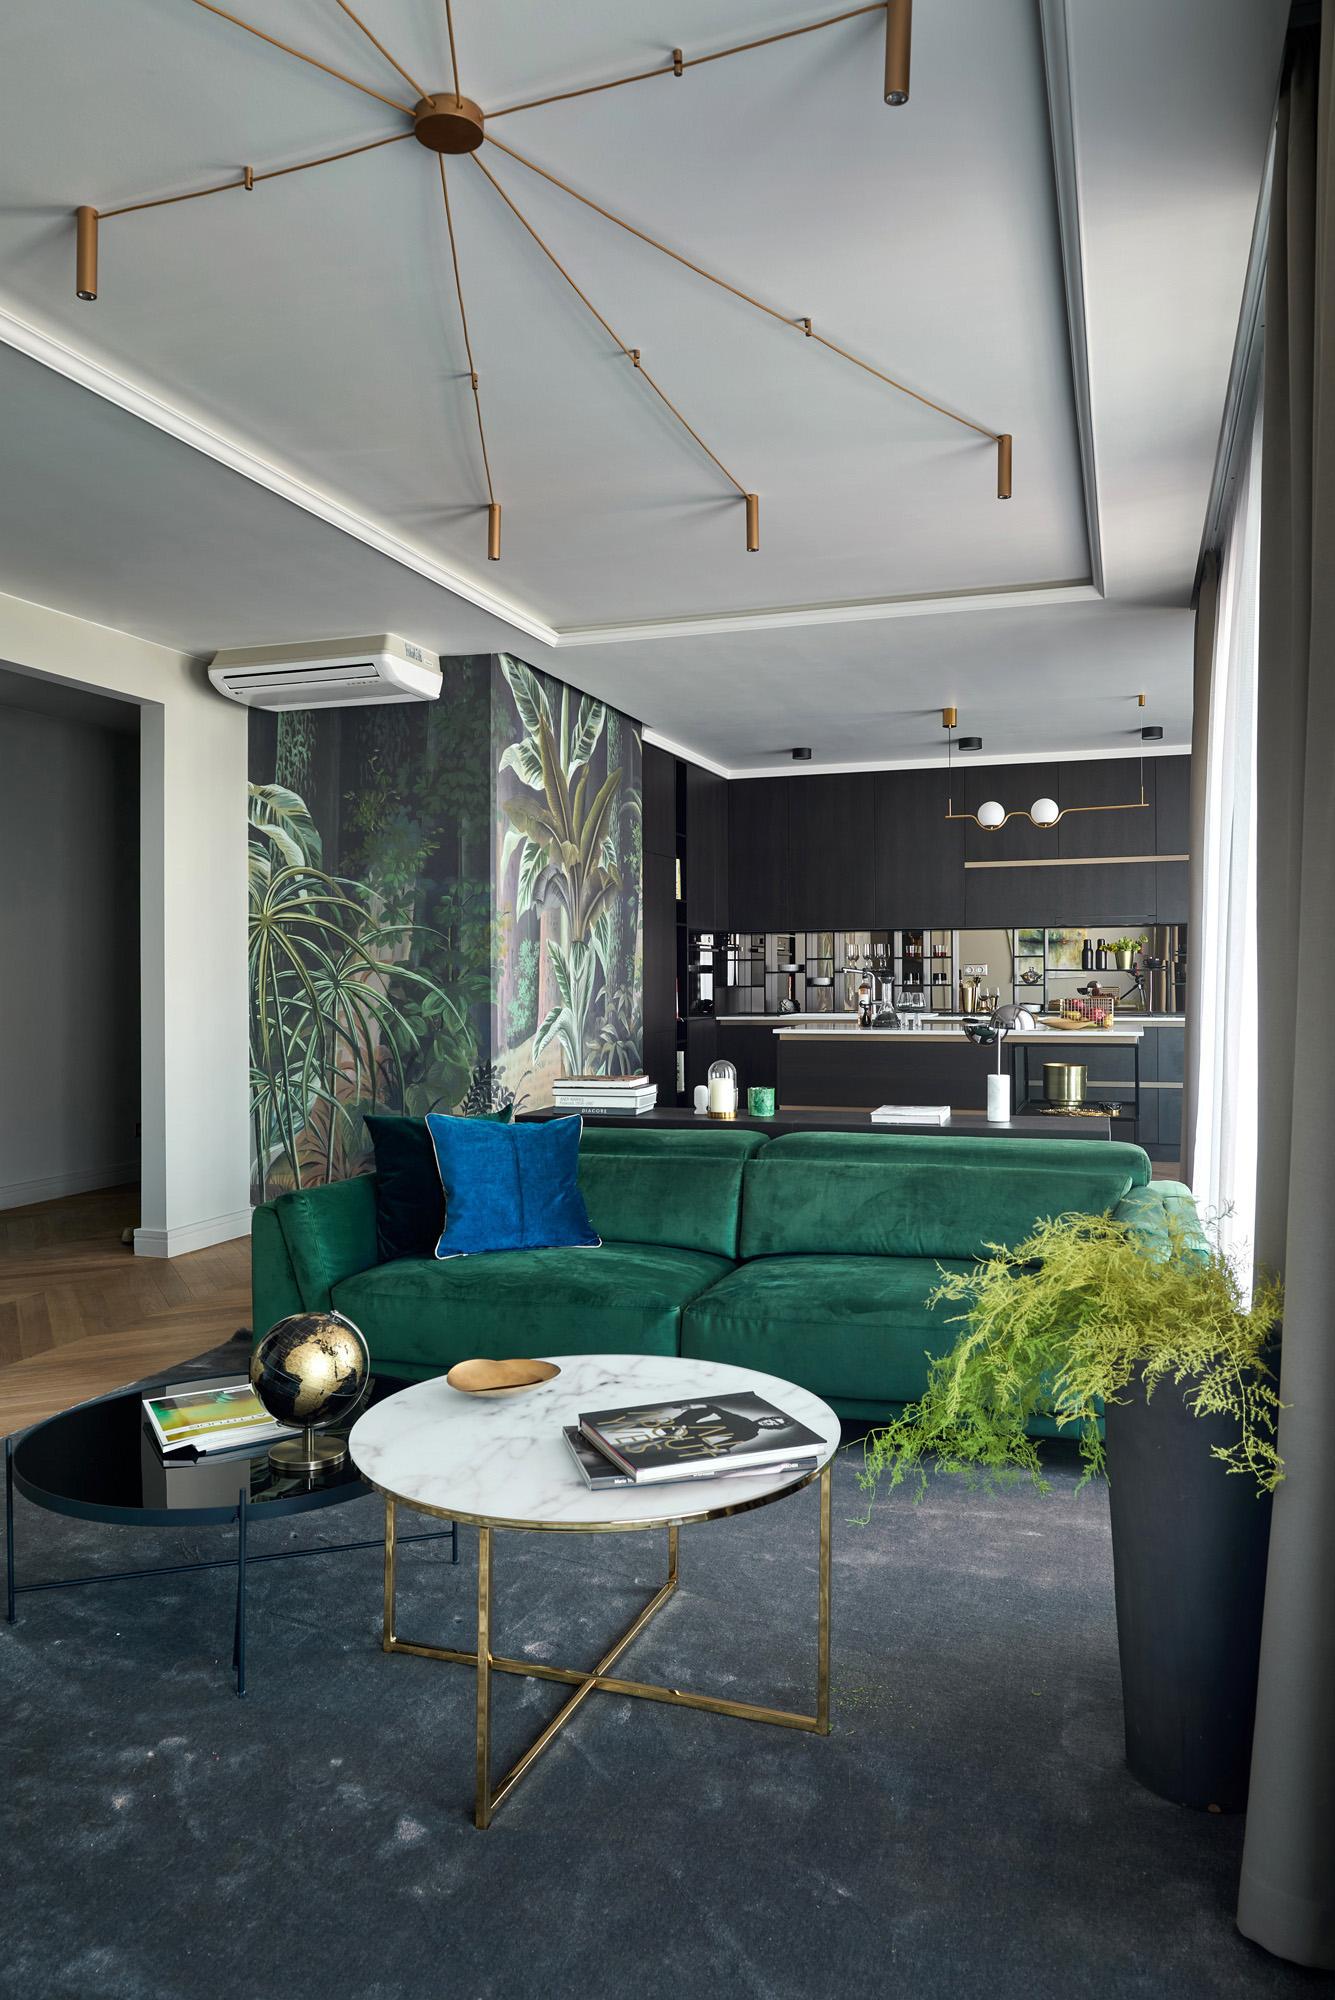 K40 Penthouse Interior Design Budapest, Hungary – Andrea Szakos